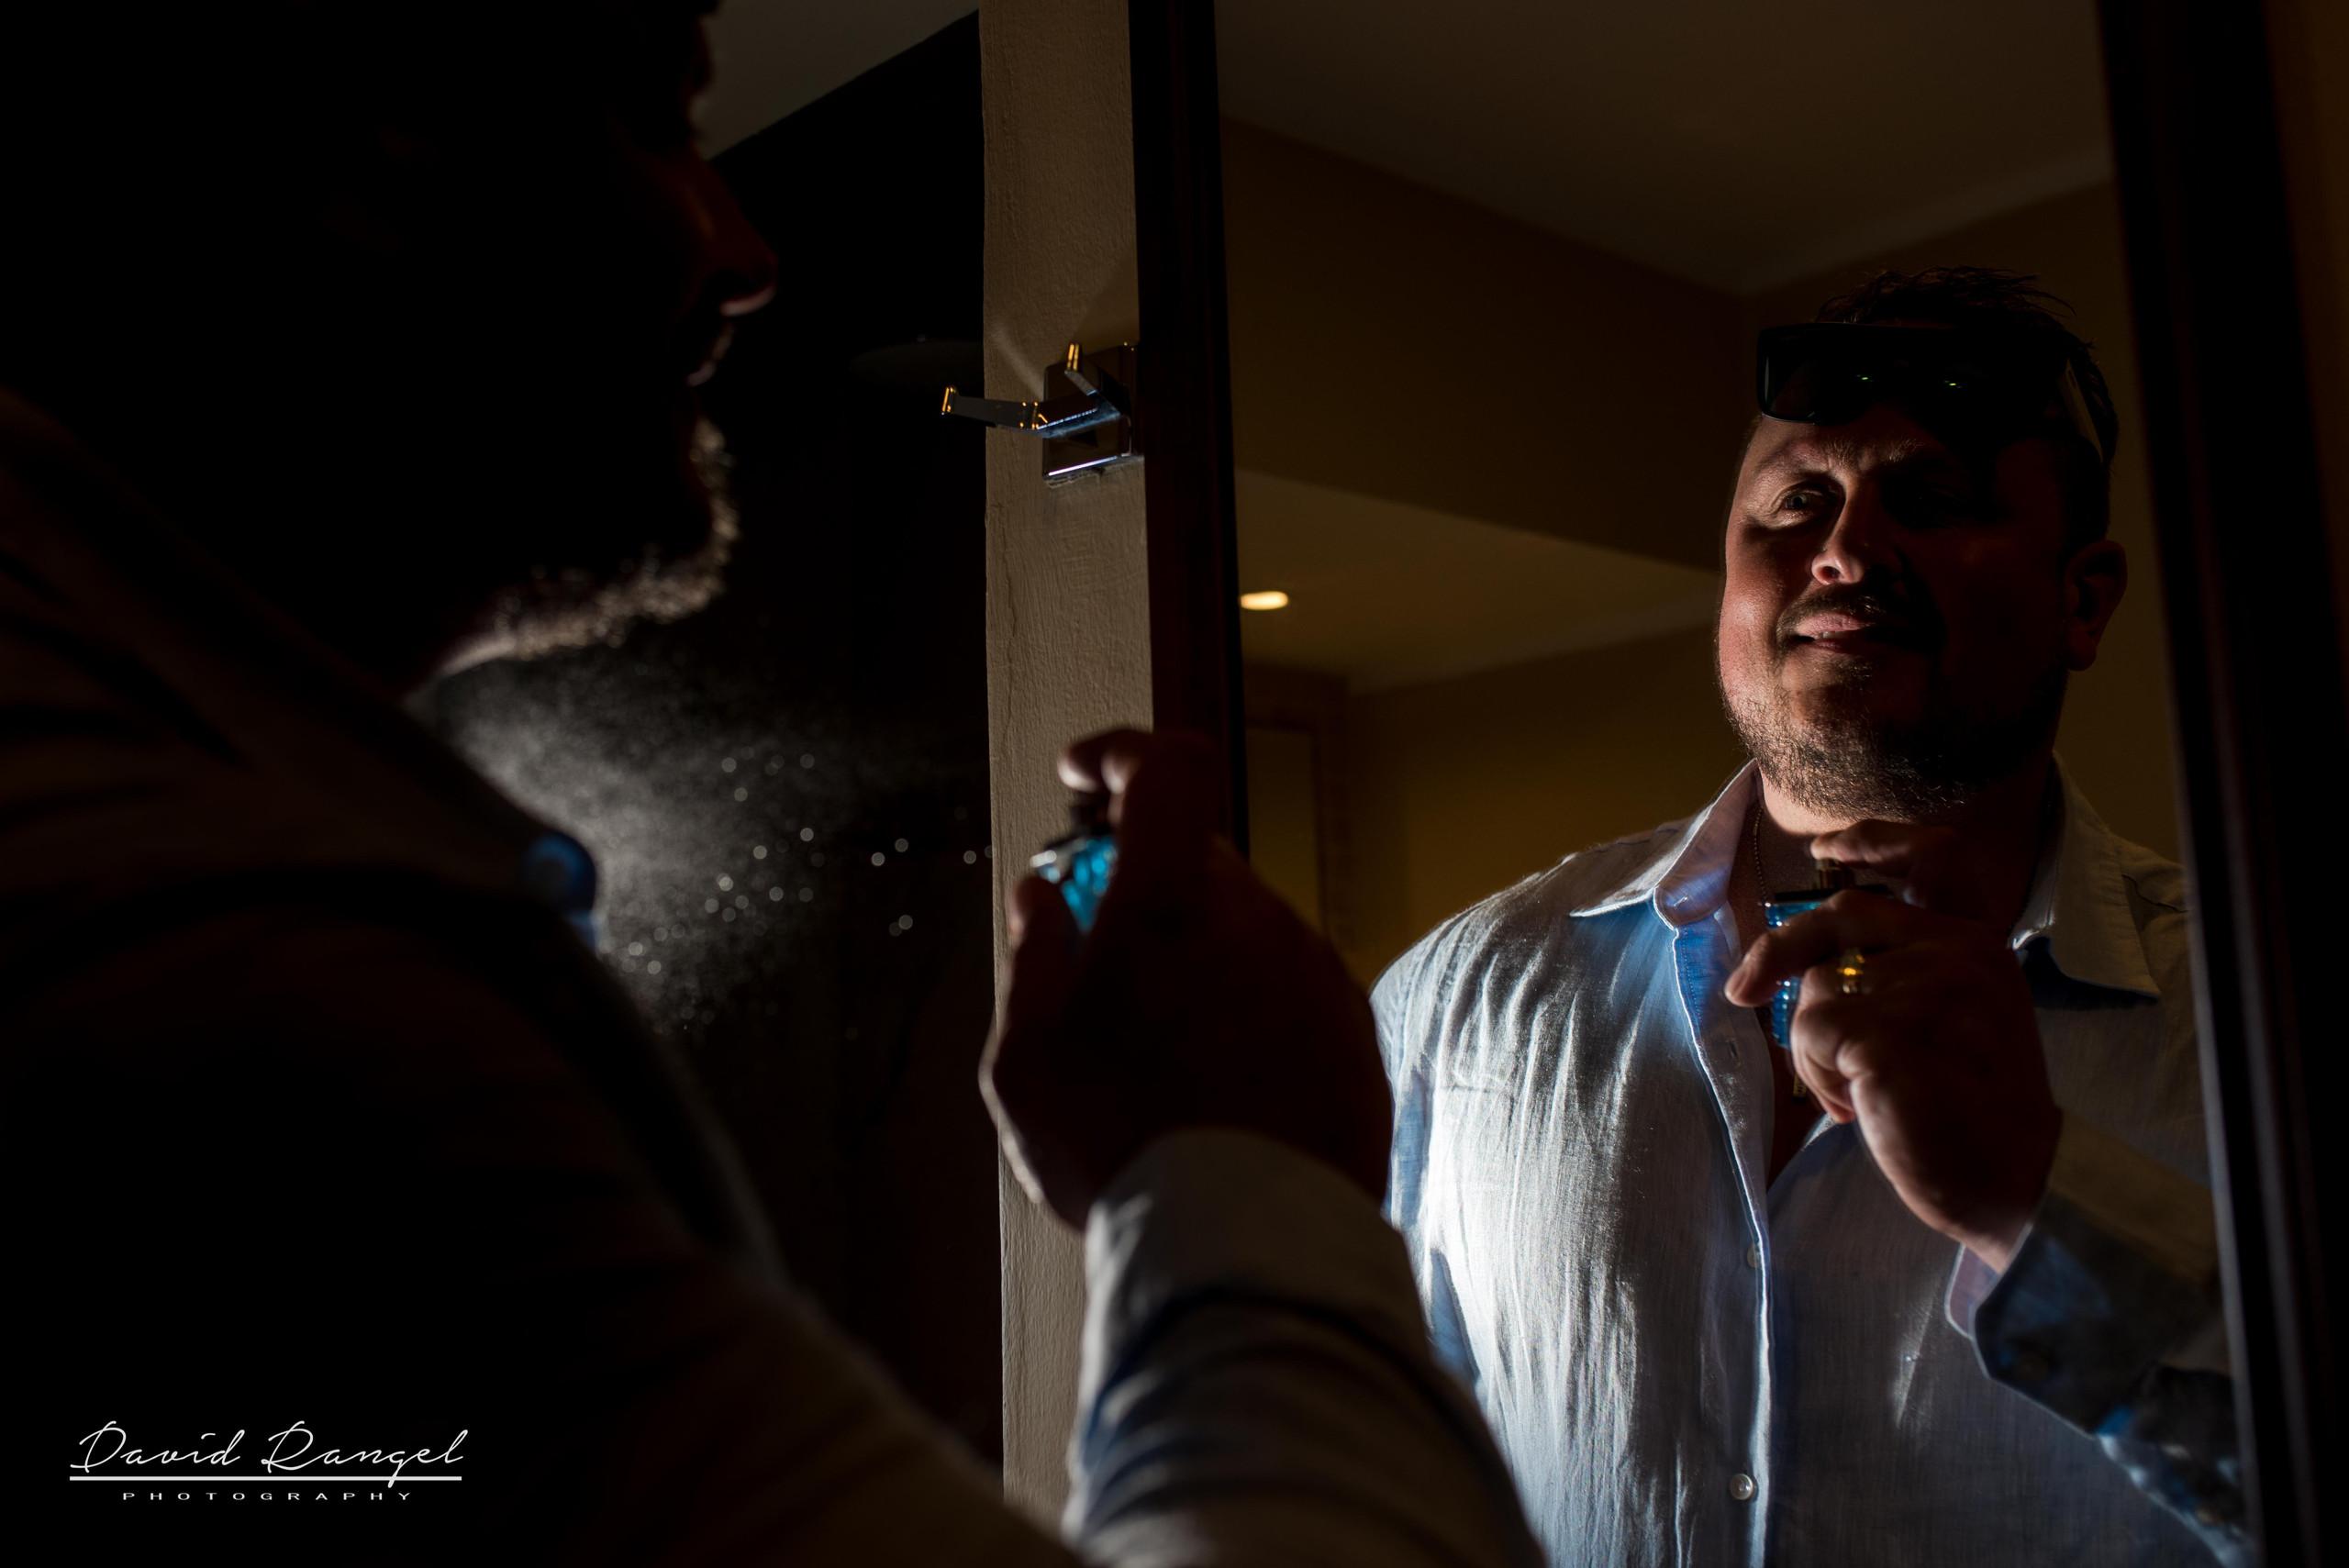 back+light+groom+getting+ready+mirror